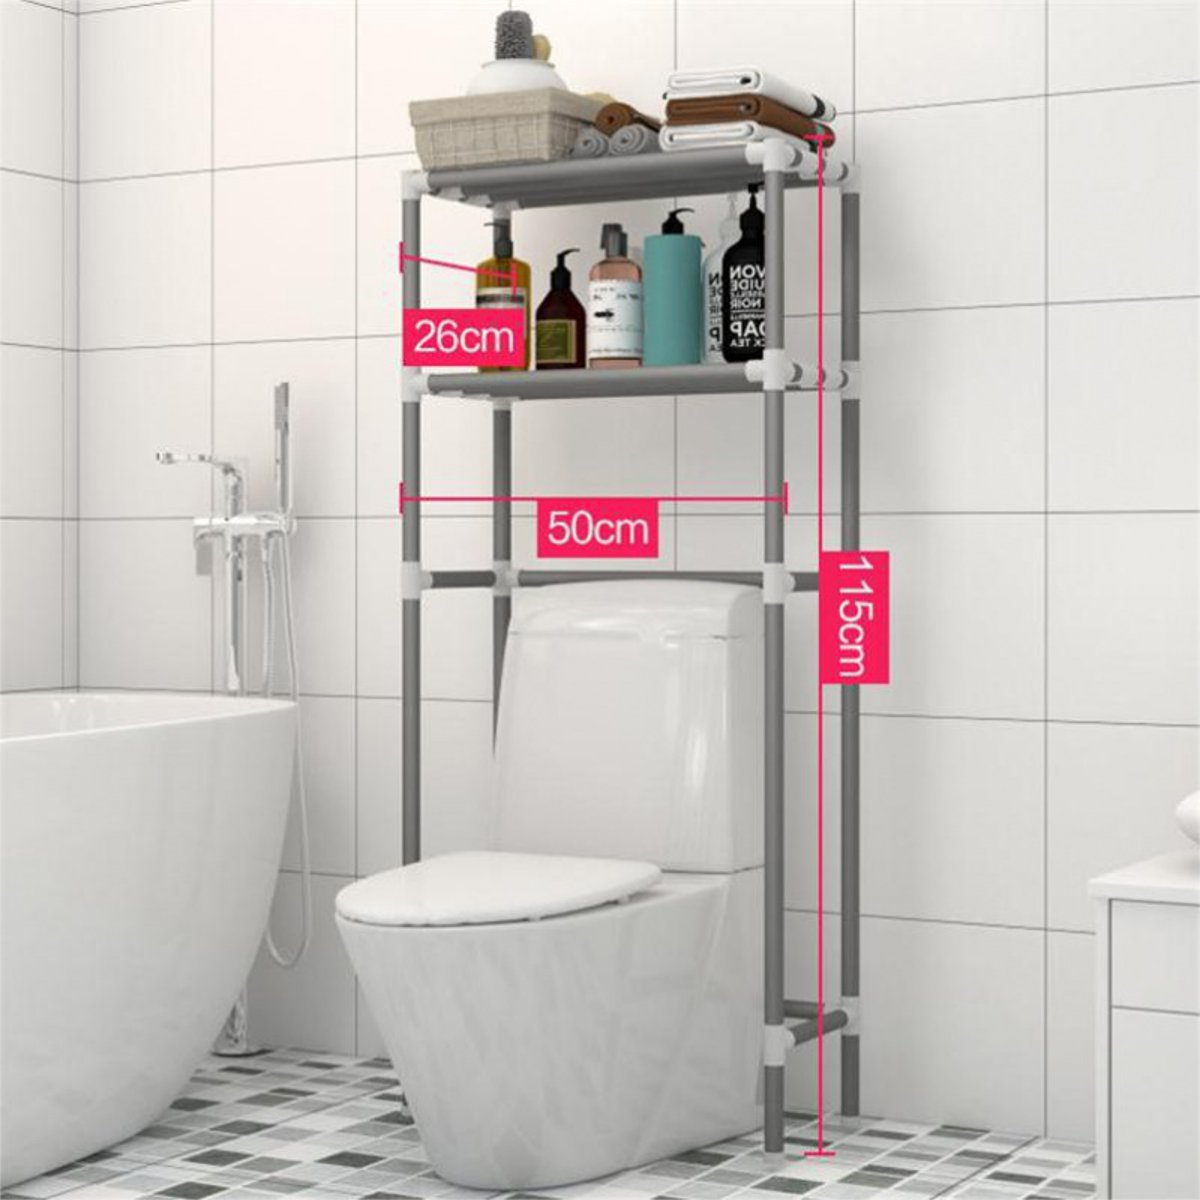 2 Tiers Over Toilet Storage Rack Holder Bathroom Space Saver Towel Shampoo Organizer Holder Bathroom Storage Shelves 50x26x115cm